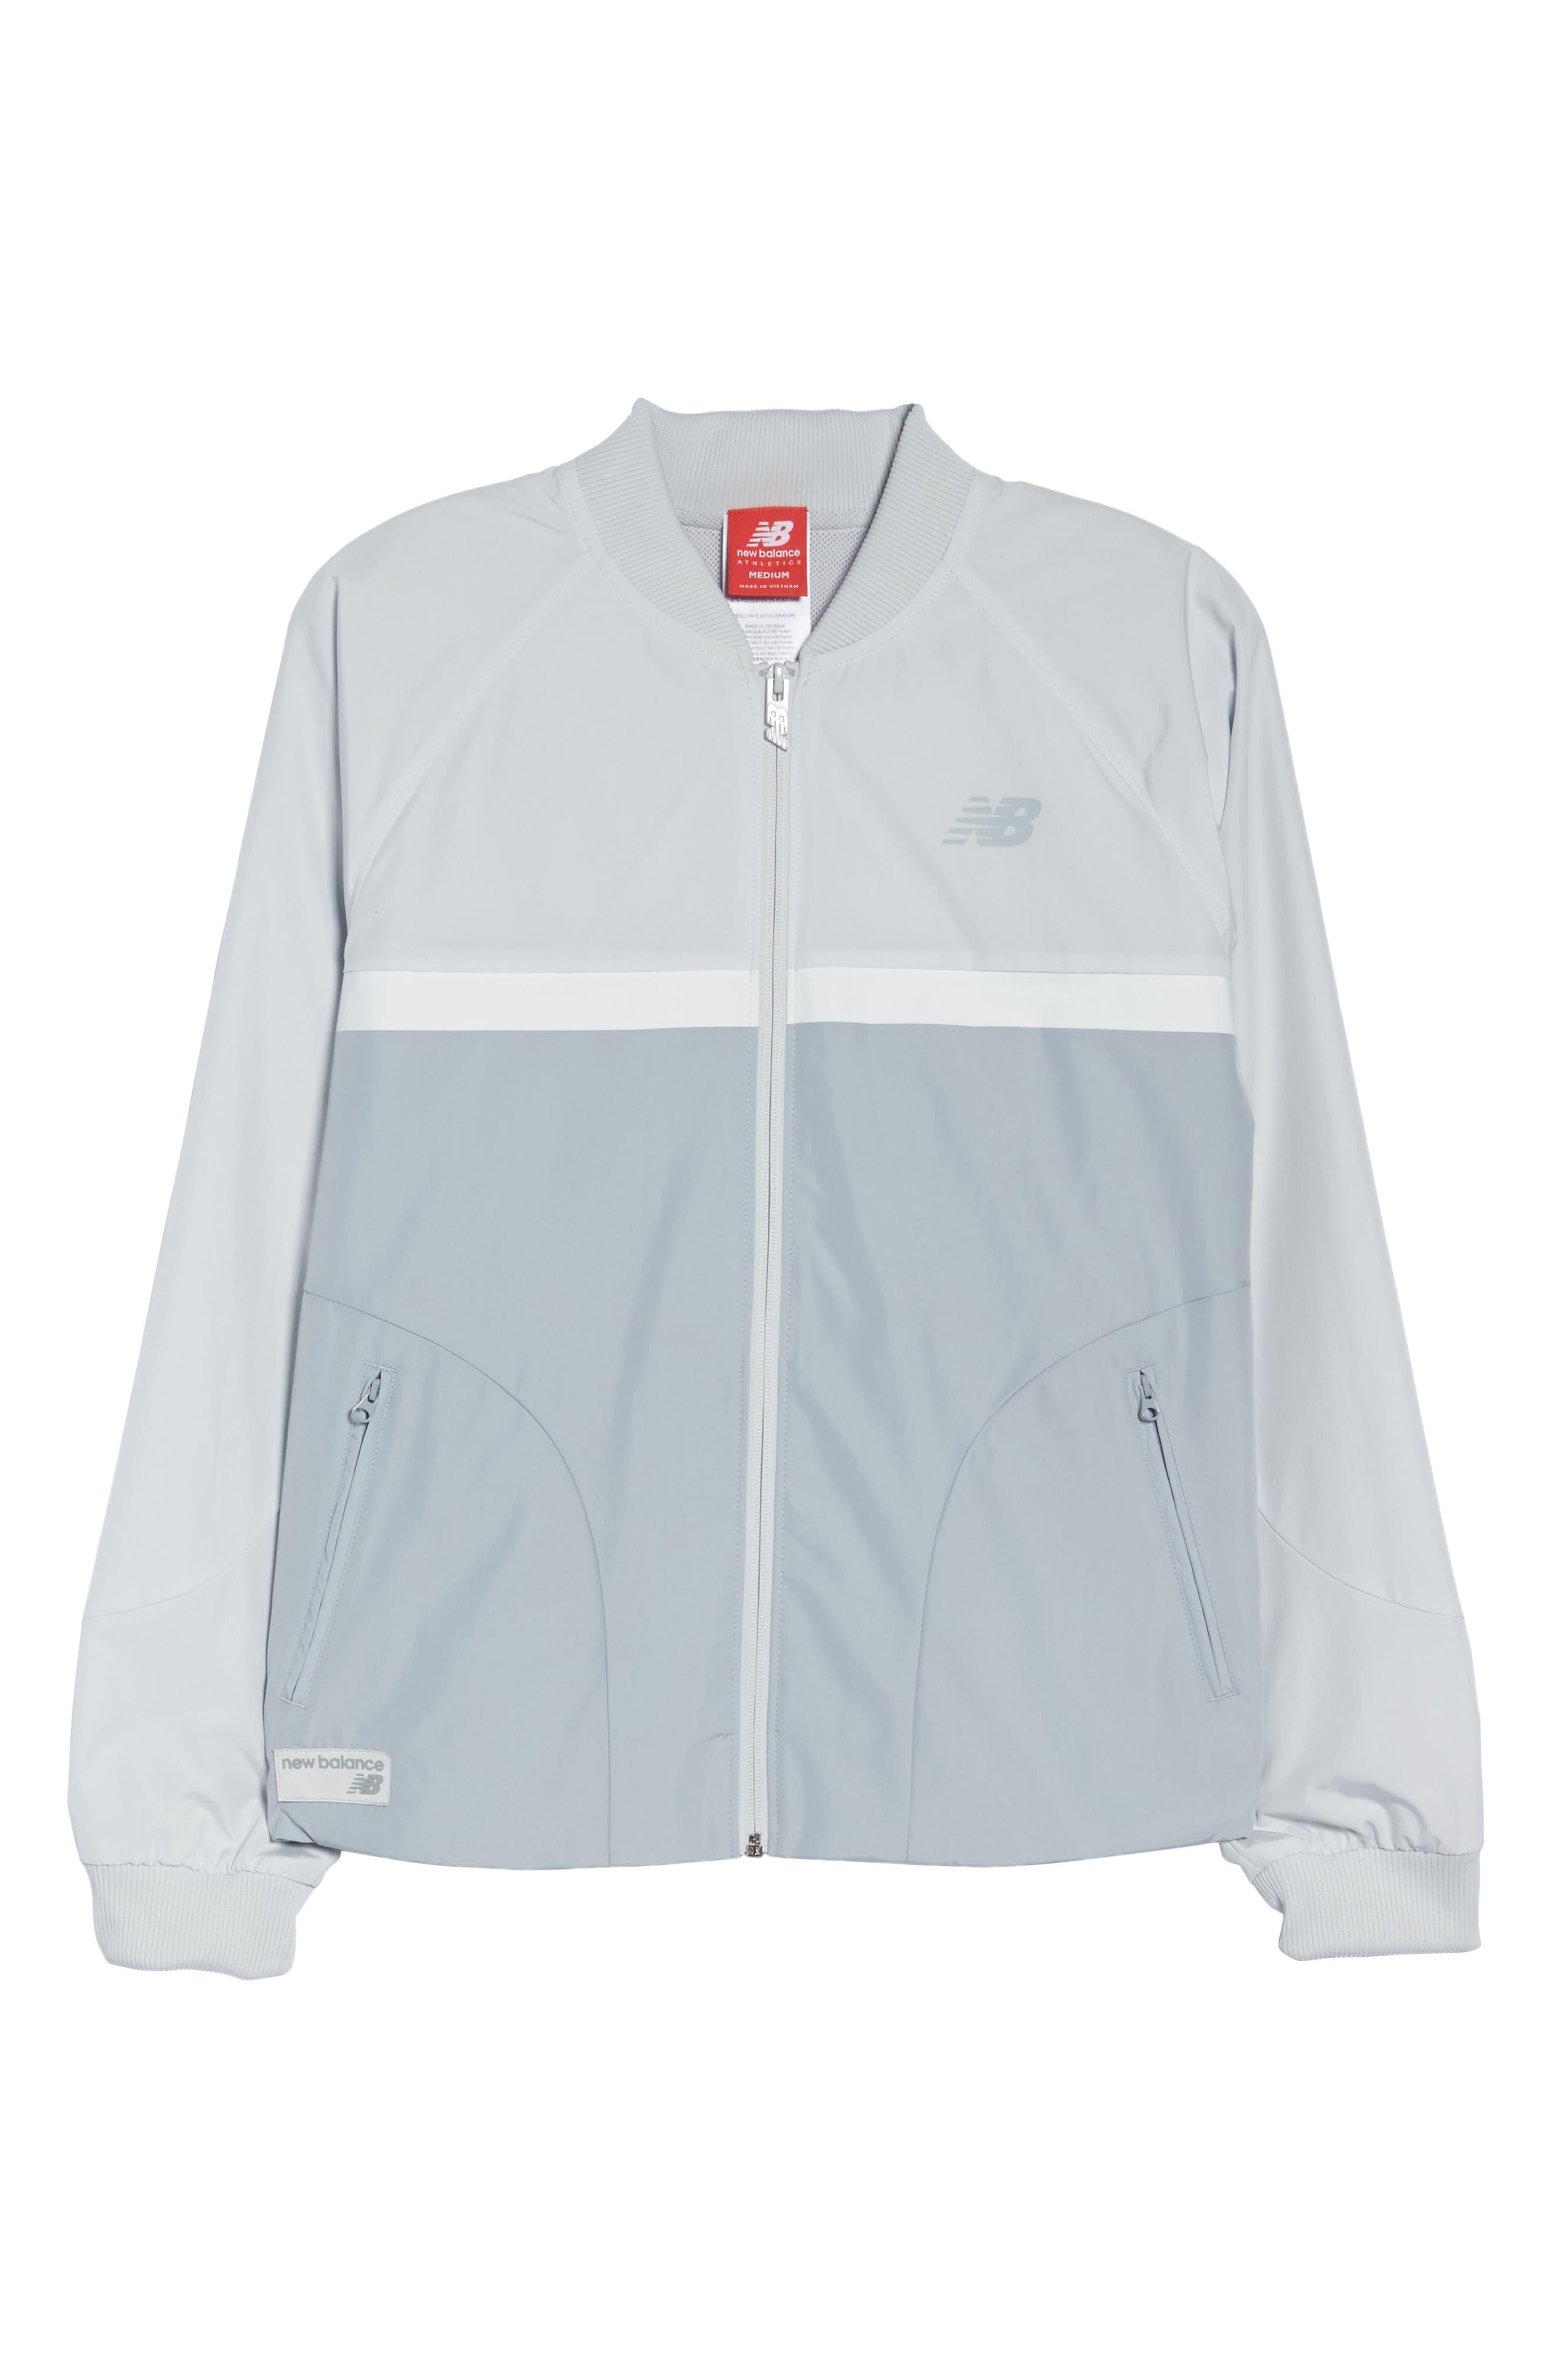 Windbreaker Jacket,                             Alternate thumbnail 5, color,                             034